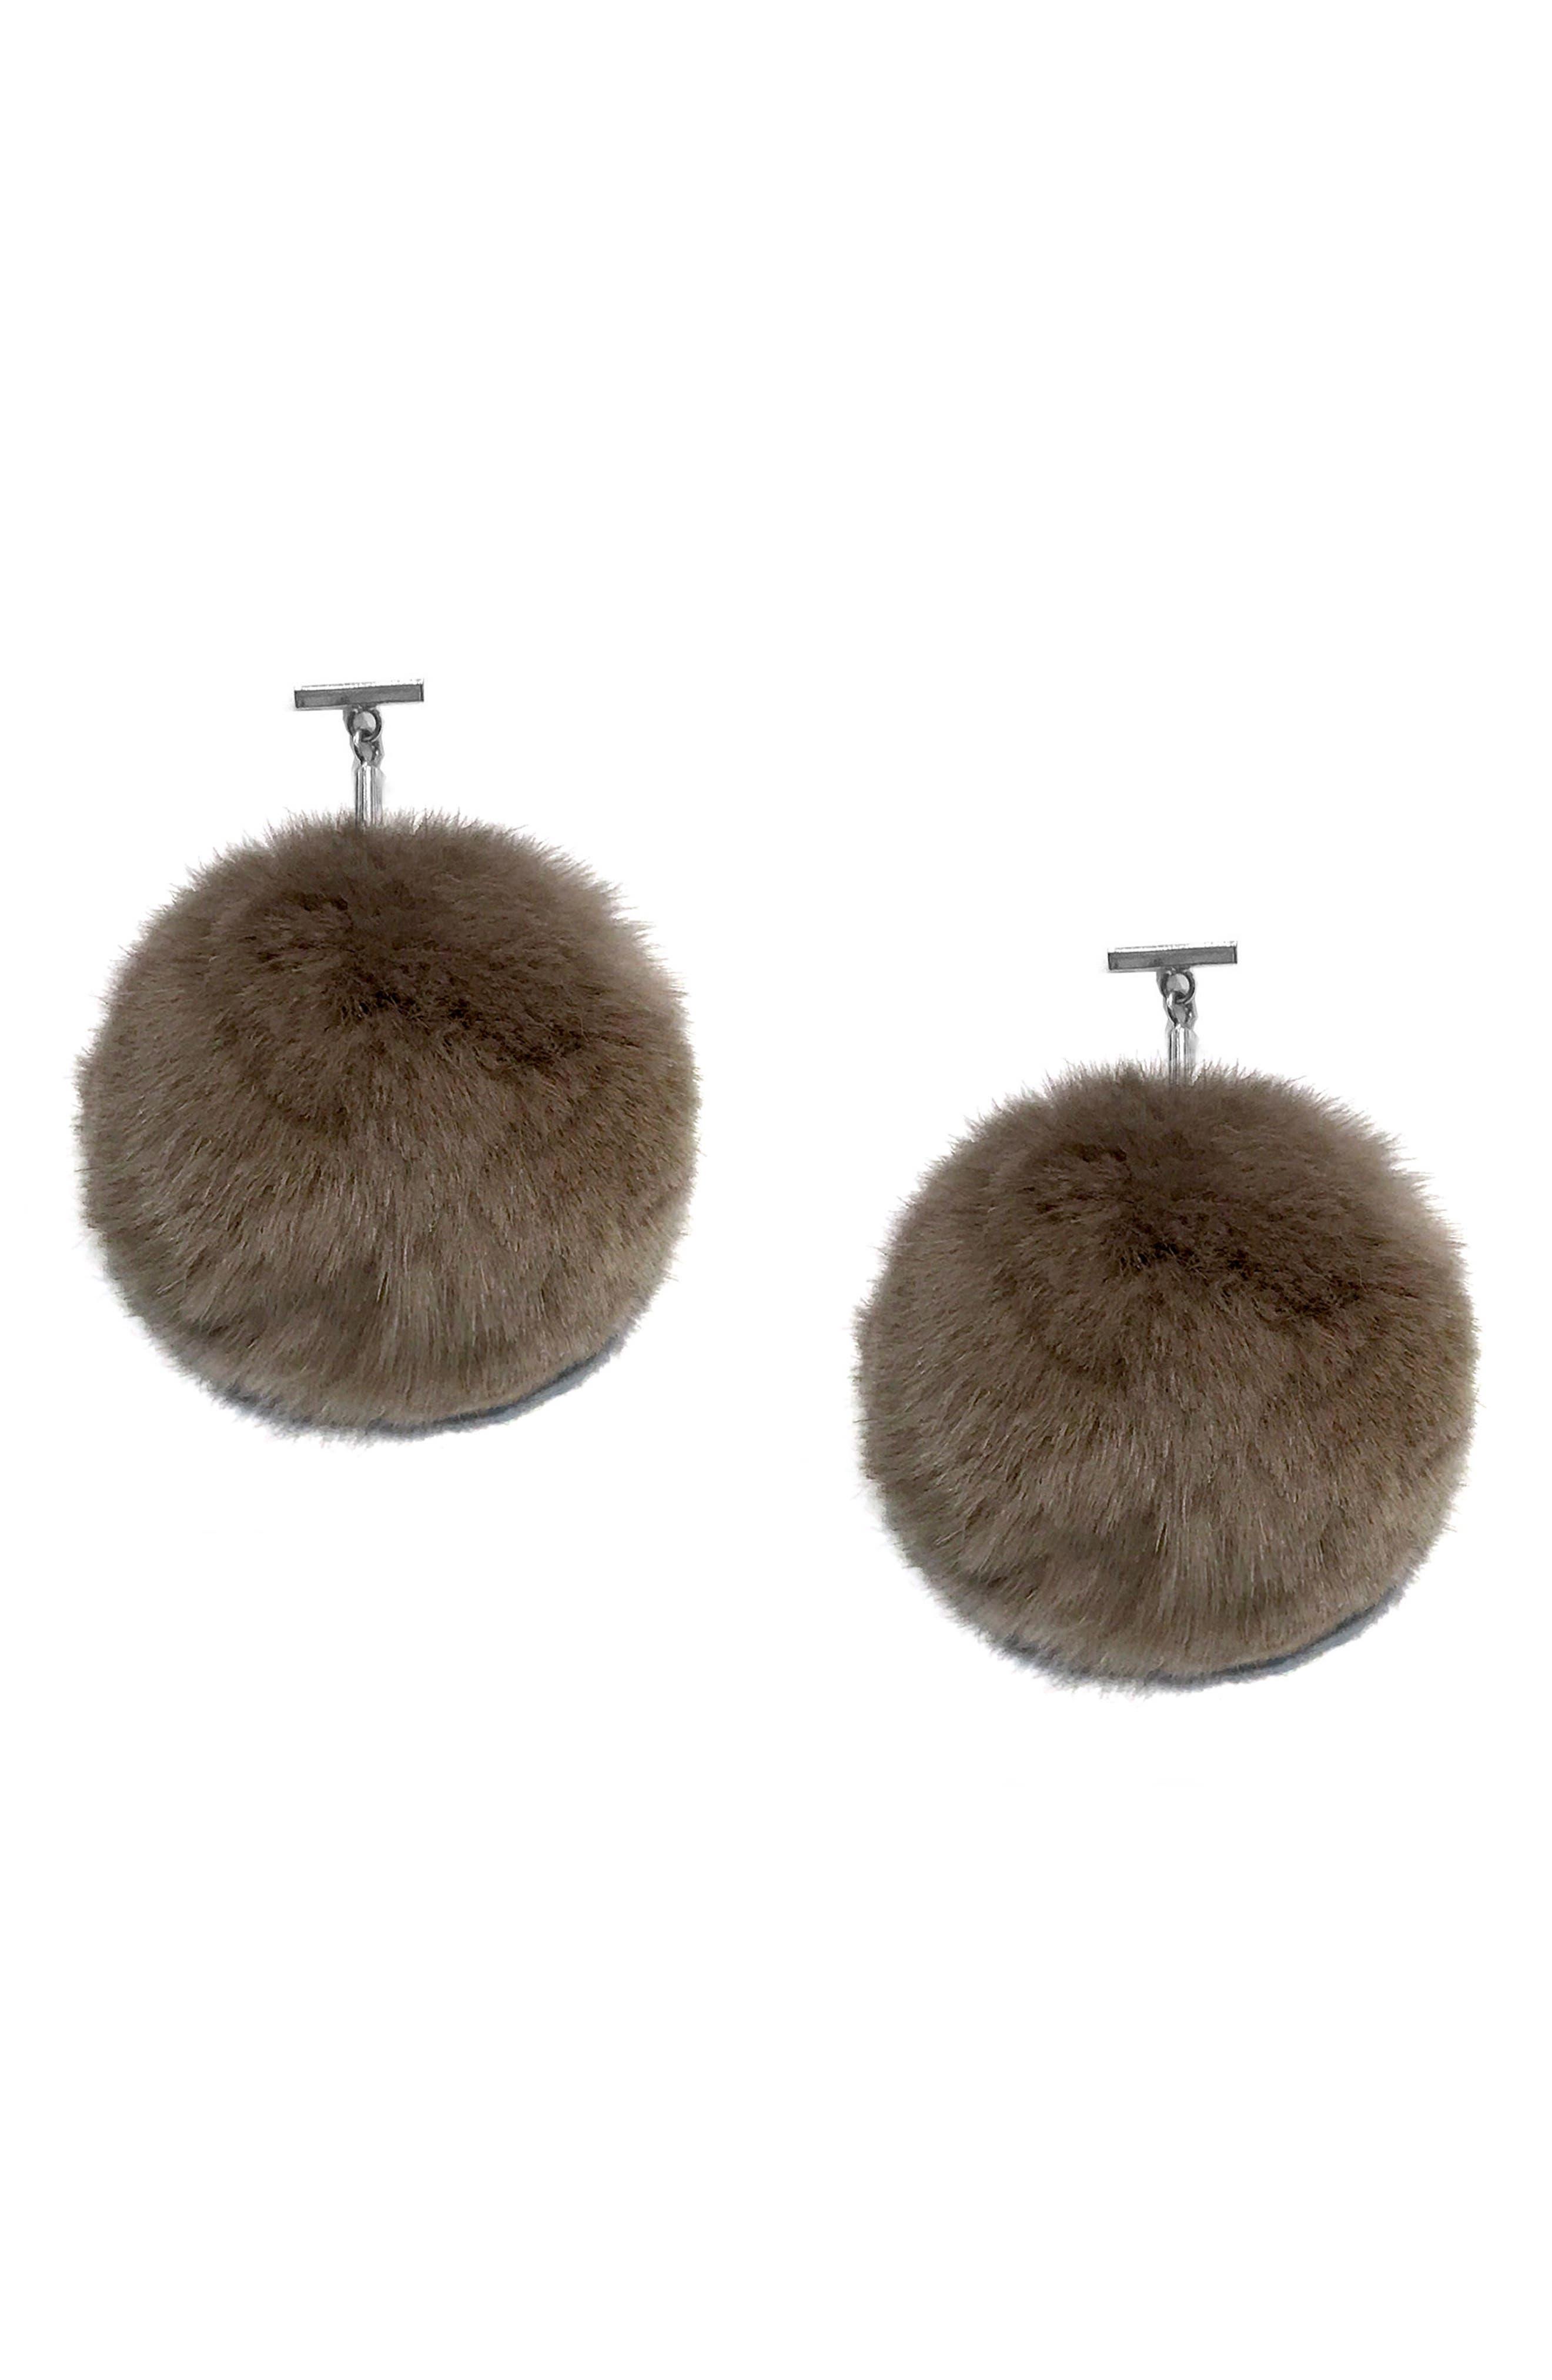 Pompom Drop Earrings,                             Main thumbnail 1, color,                             020